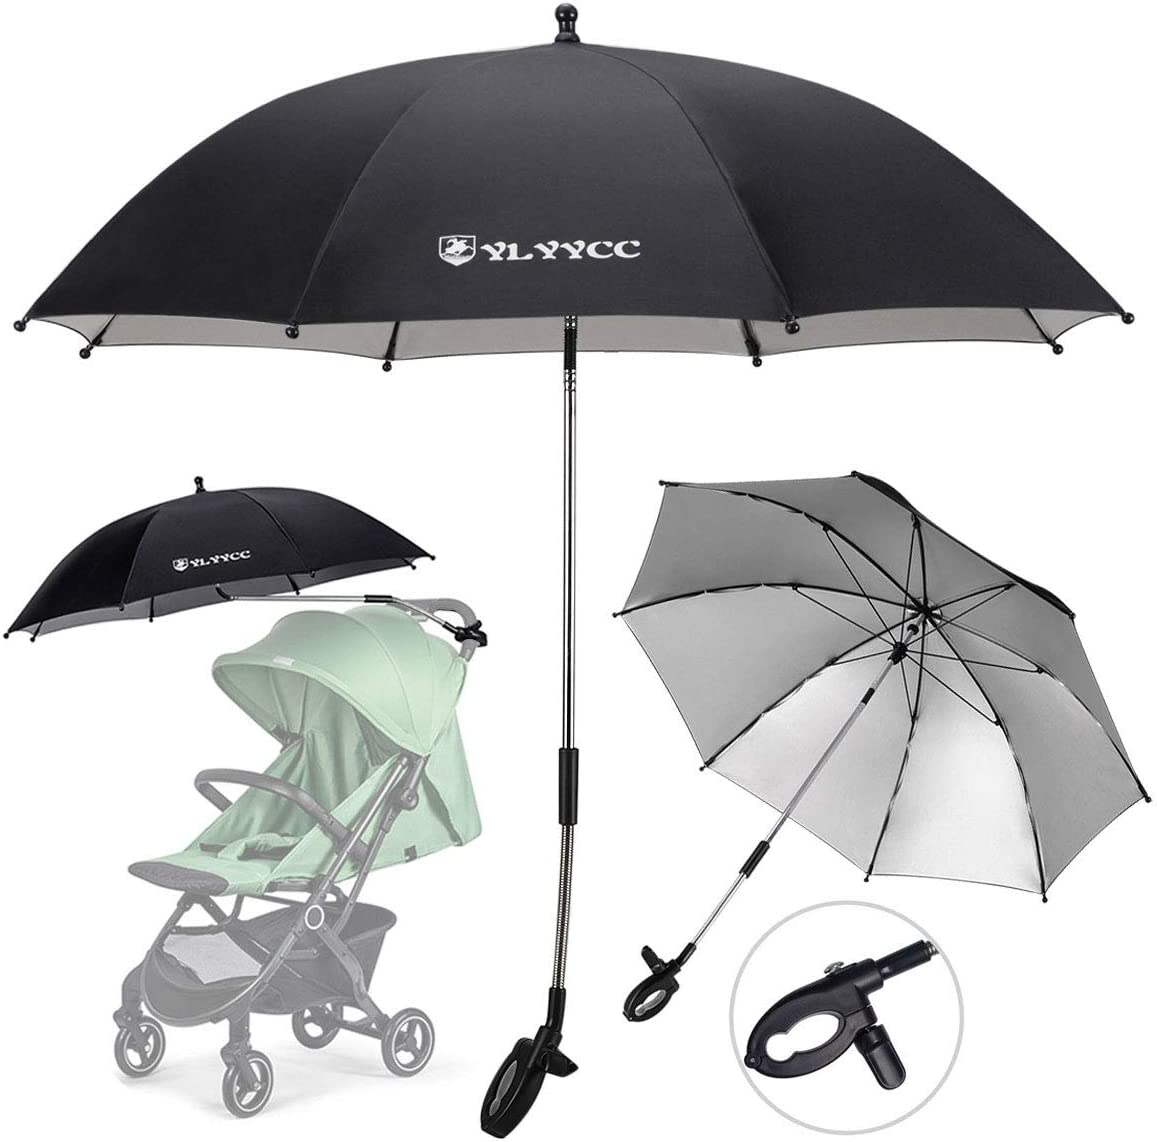 YLYYCC Baby Stroller Sunshade/Stroller Umbrella/Uv Protection Umbrella 360 Degrees Adjustable Direction Stroller Accessories